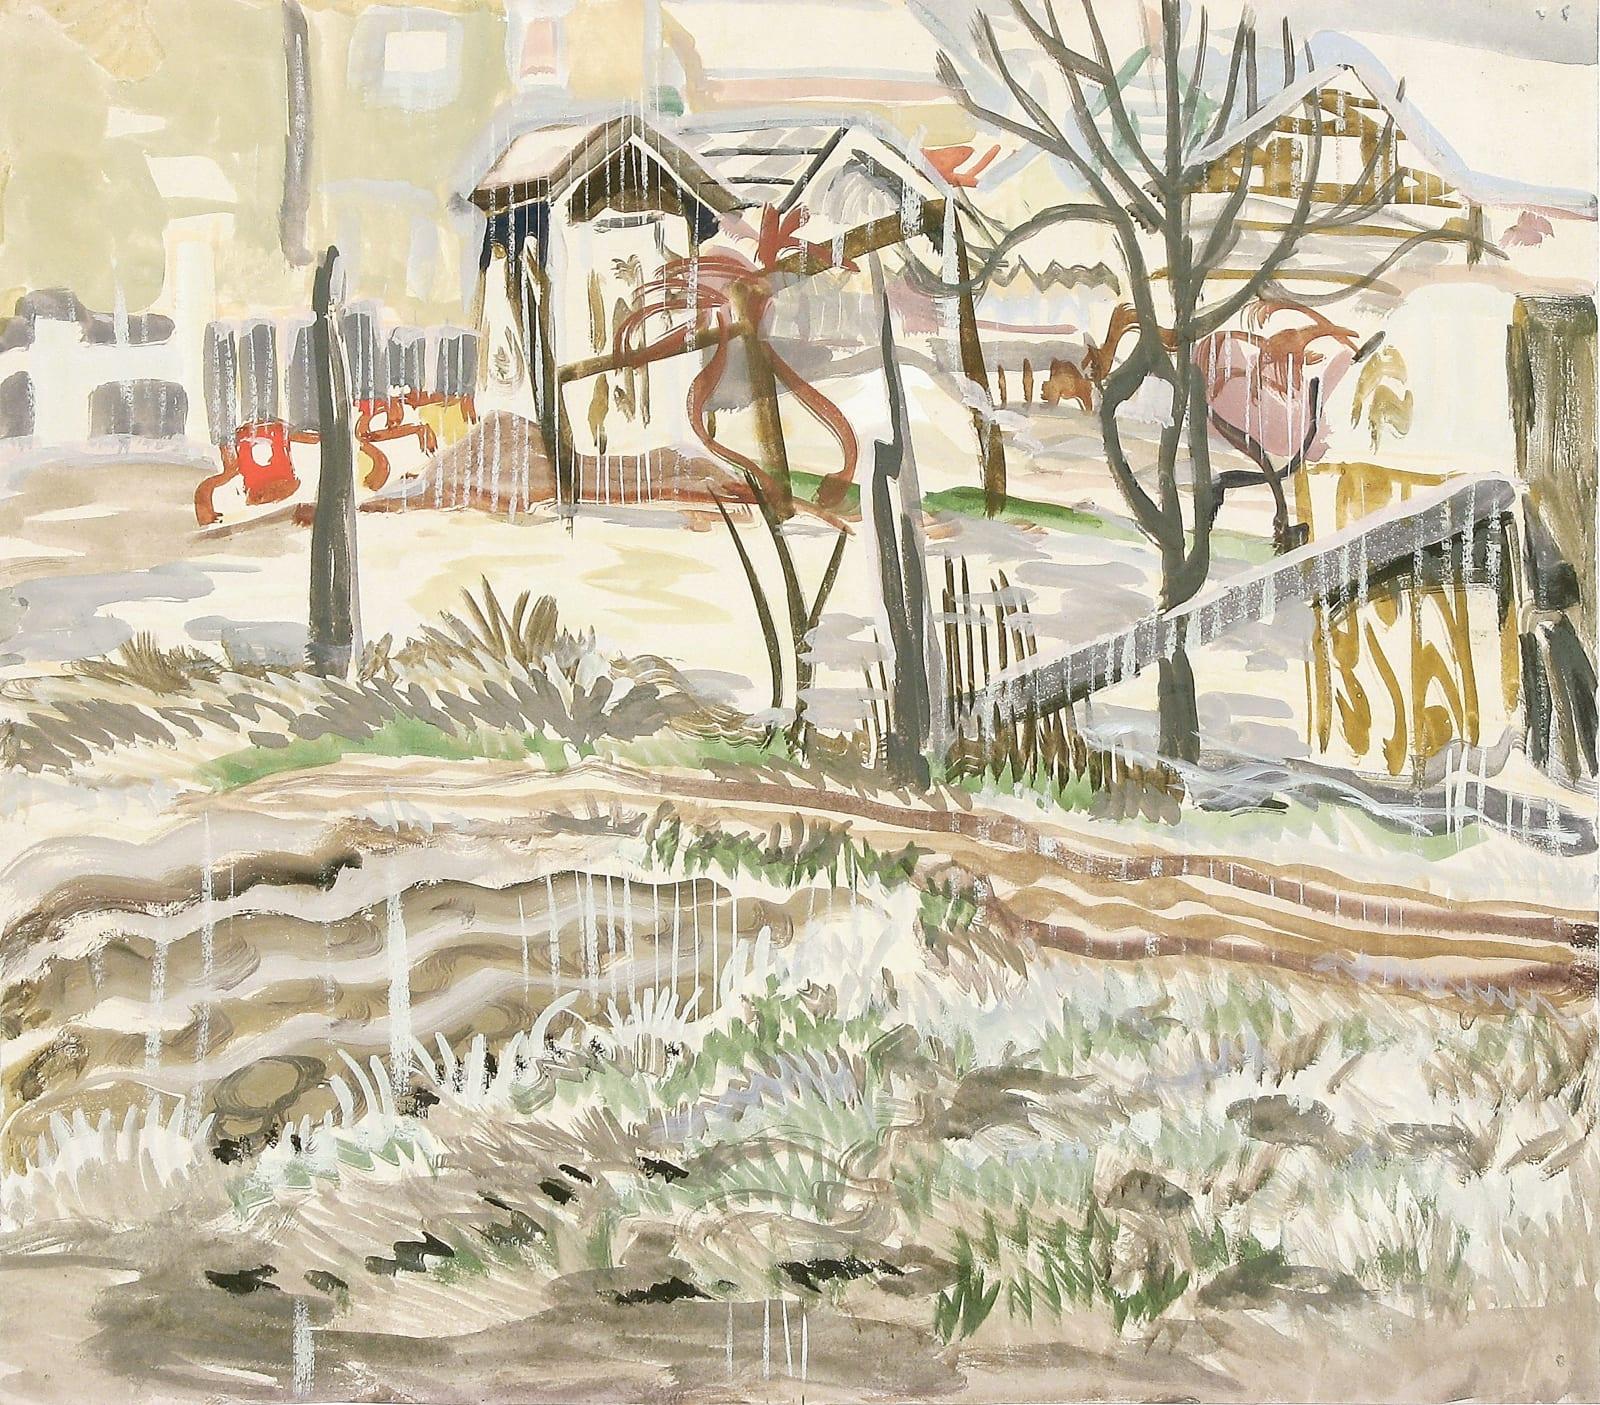 Charles Ephraim Burchfield, Untitled (March-21-1917), 1917